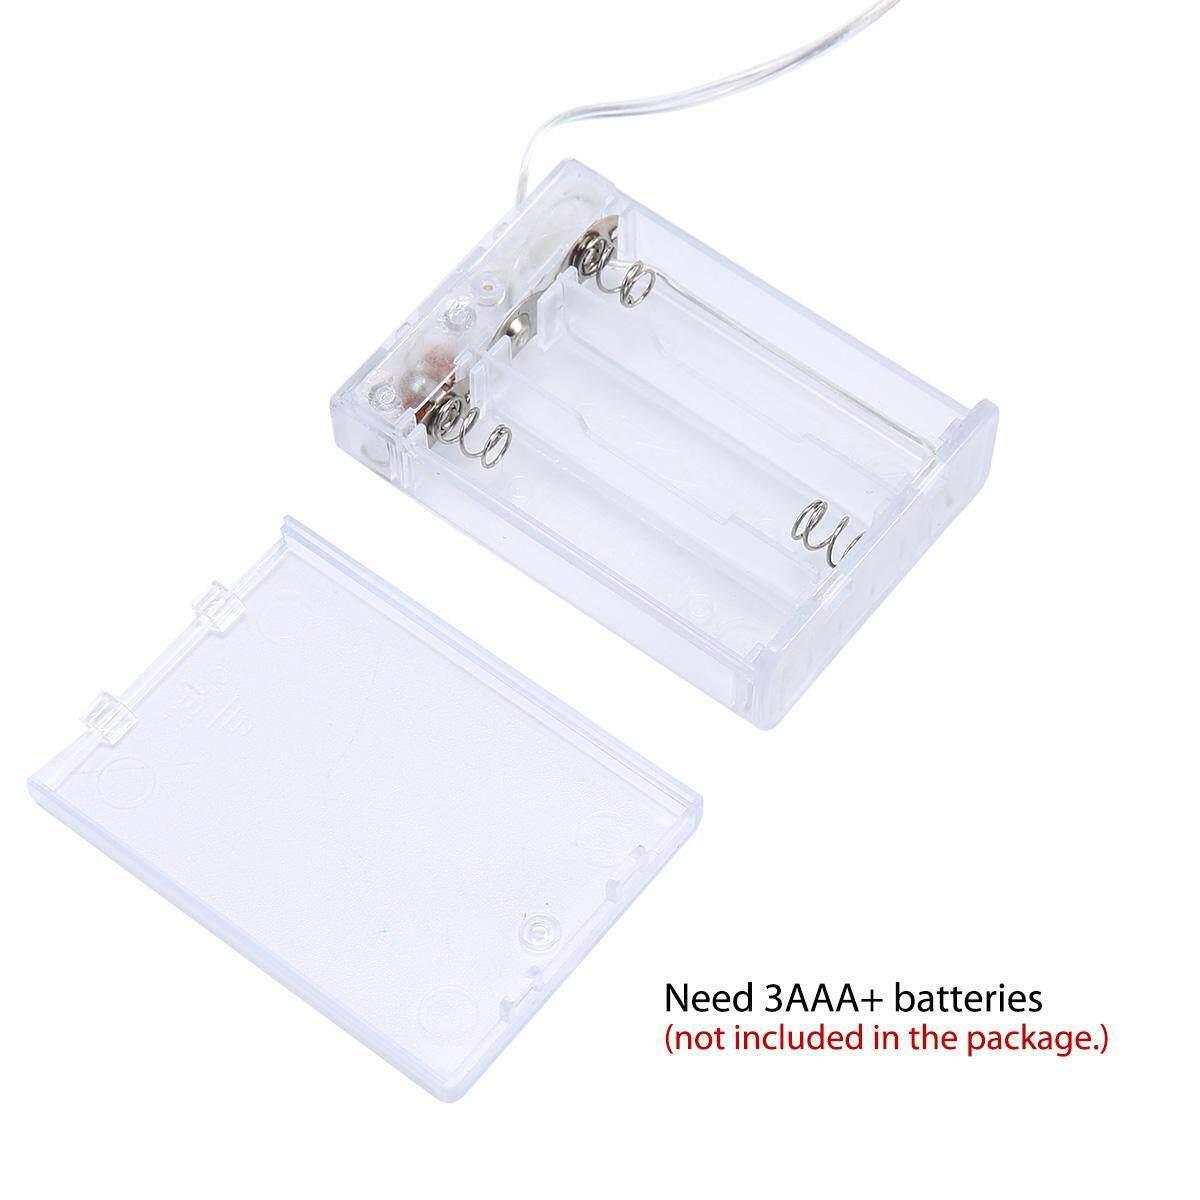 ... Treeone 10 Meters 100LED Battery Box Decorative Lights Fairy Light - 3 ...